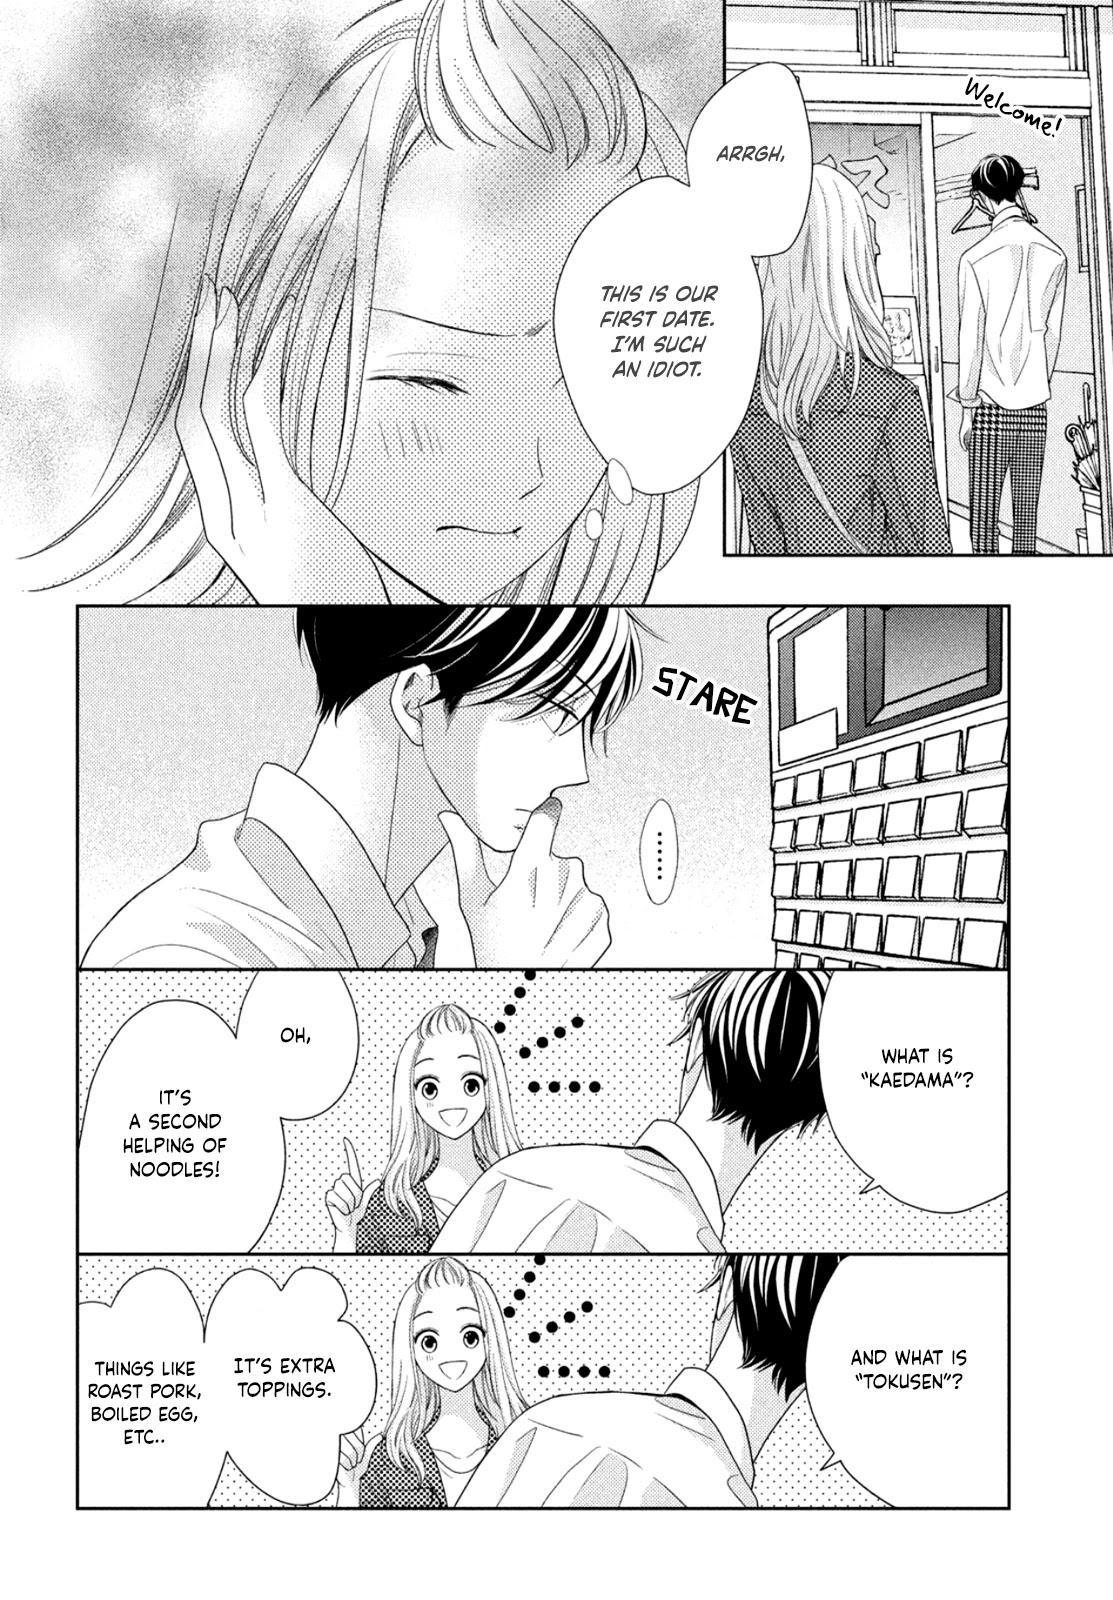 Arashi-Kun No Dakimakura Chapter 7: Because We're The Same page 16 - Mangakakalots.com